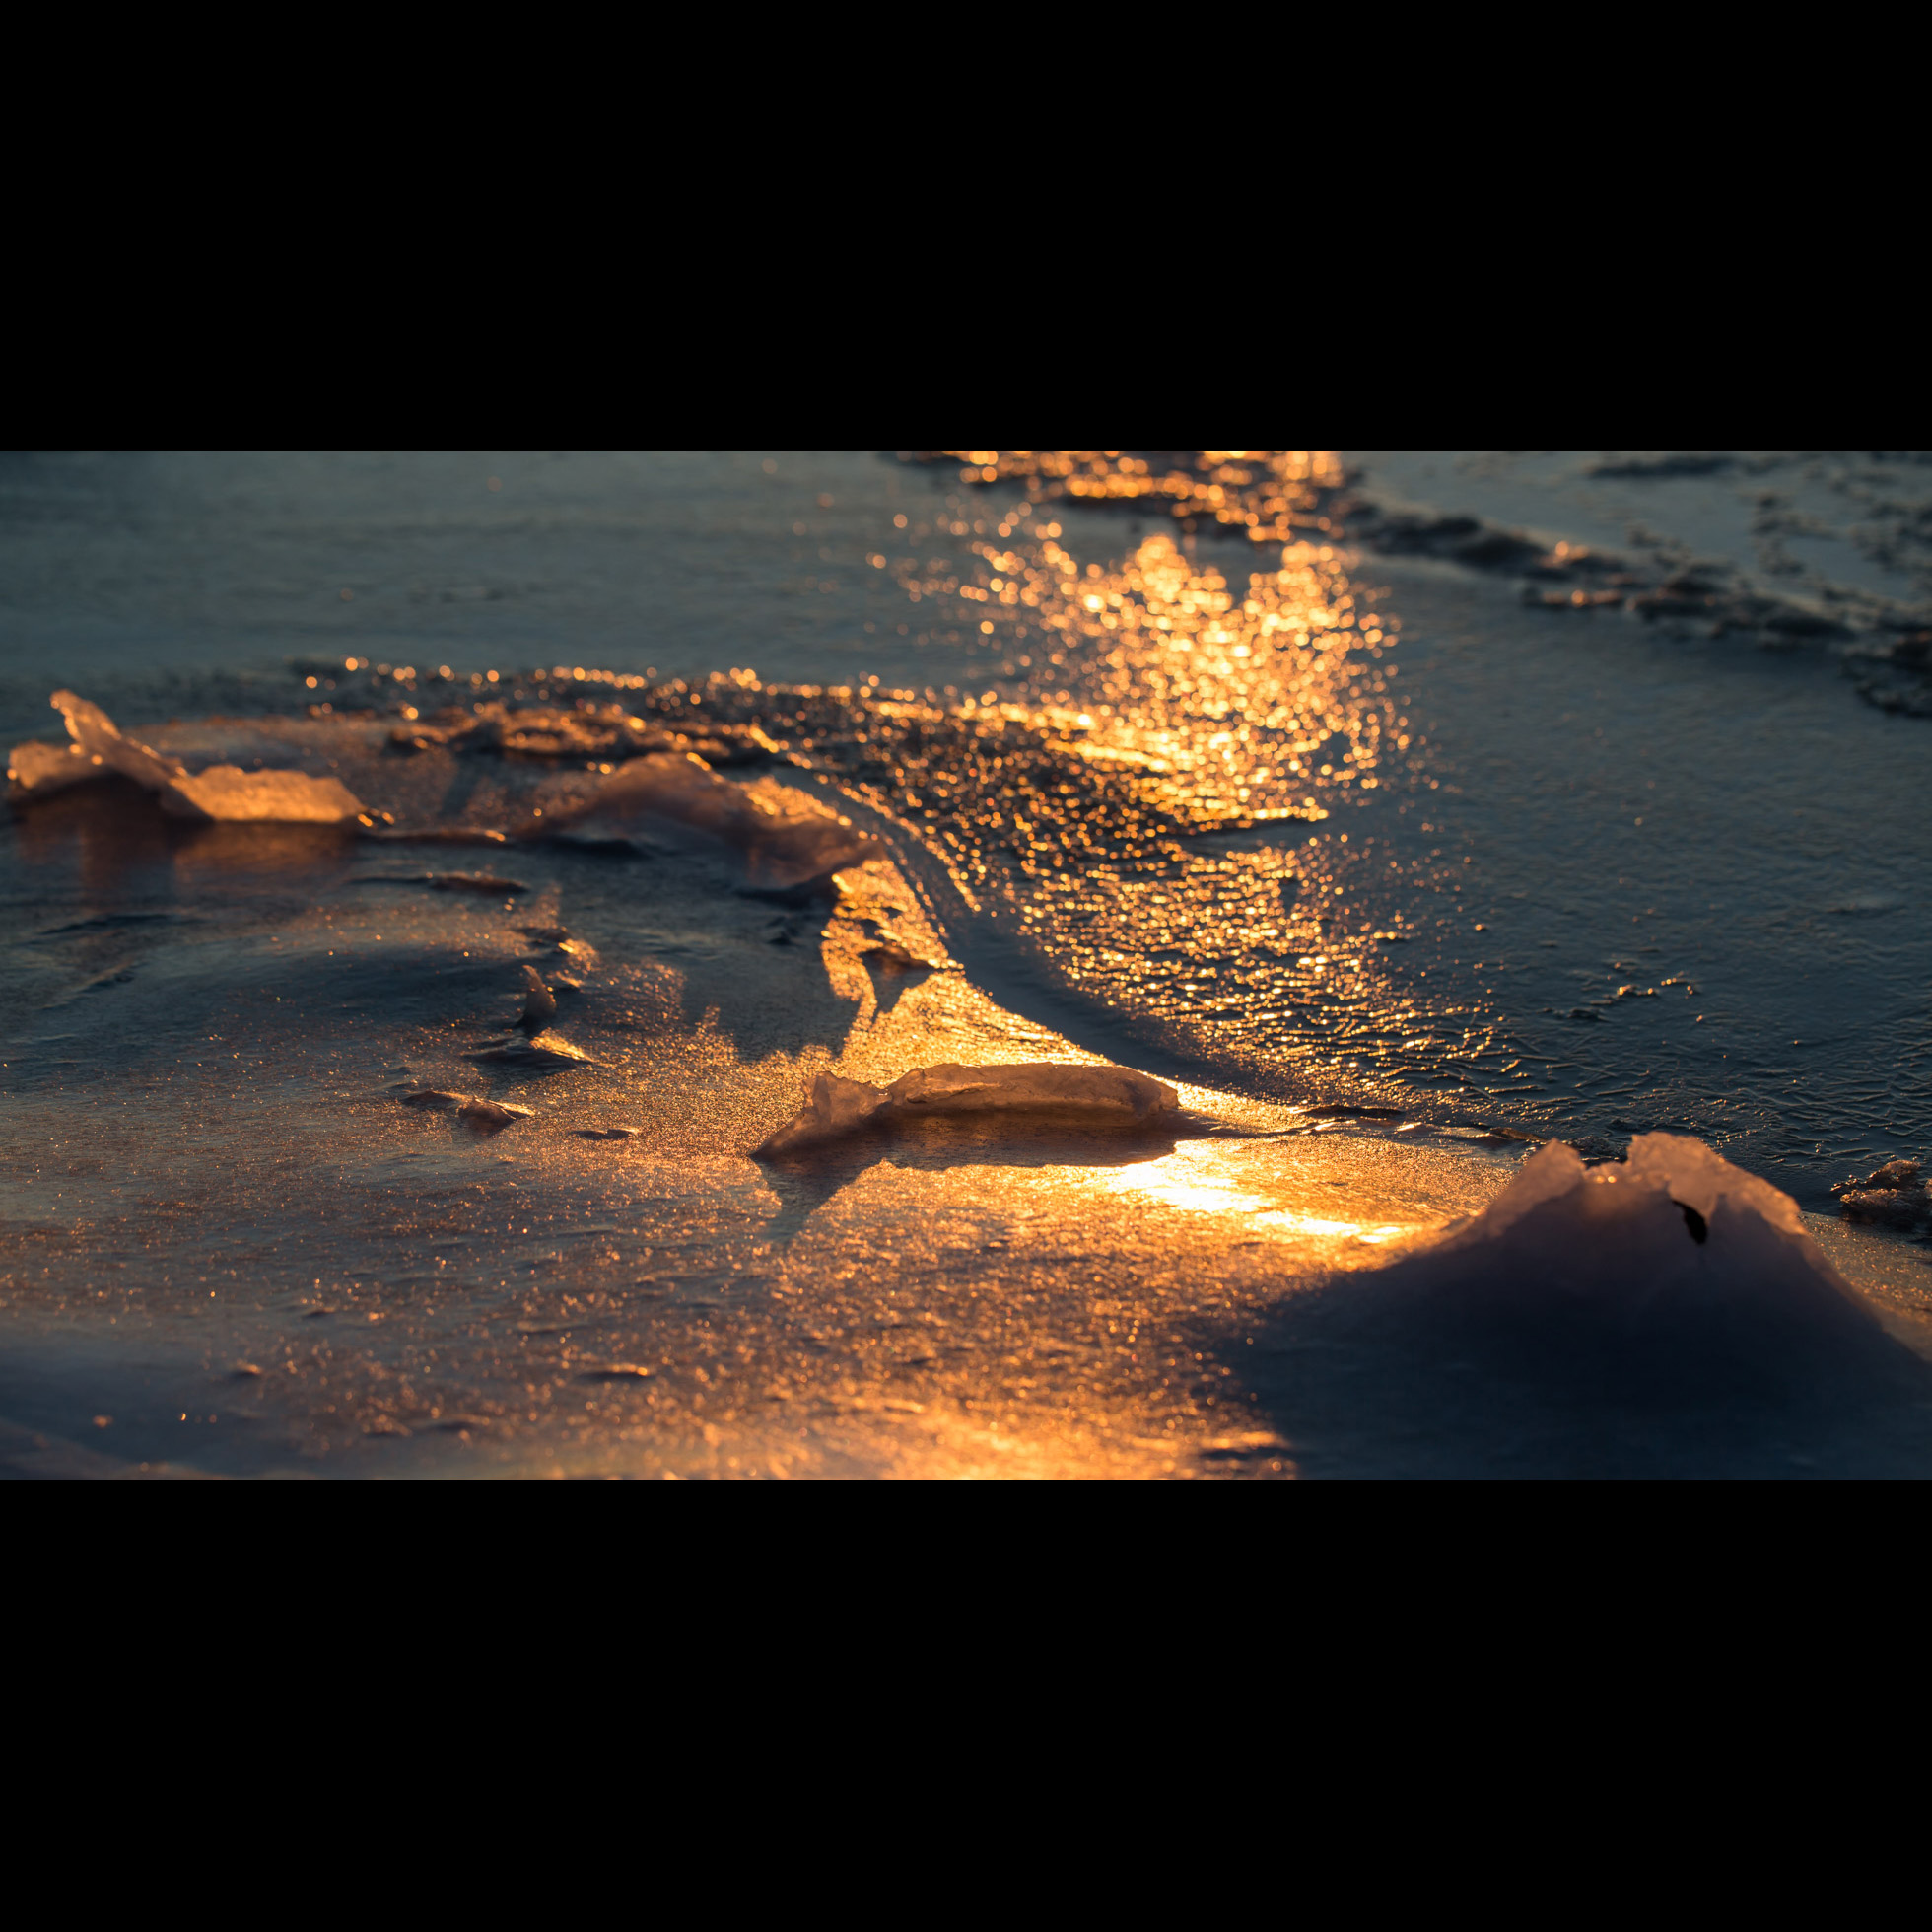 2.14 SUNSET OVER ICE